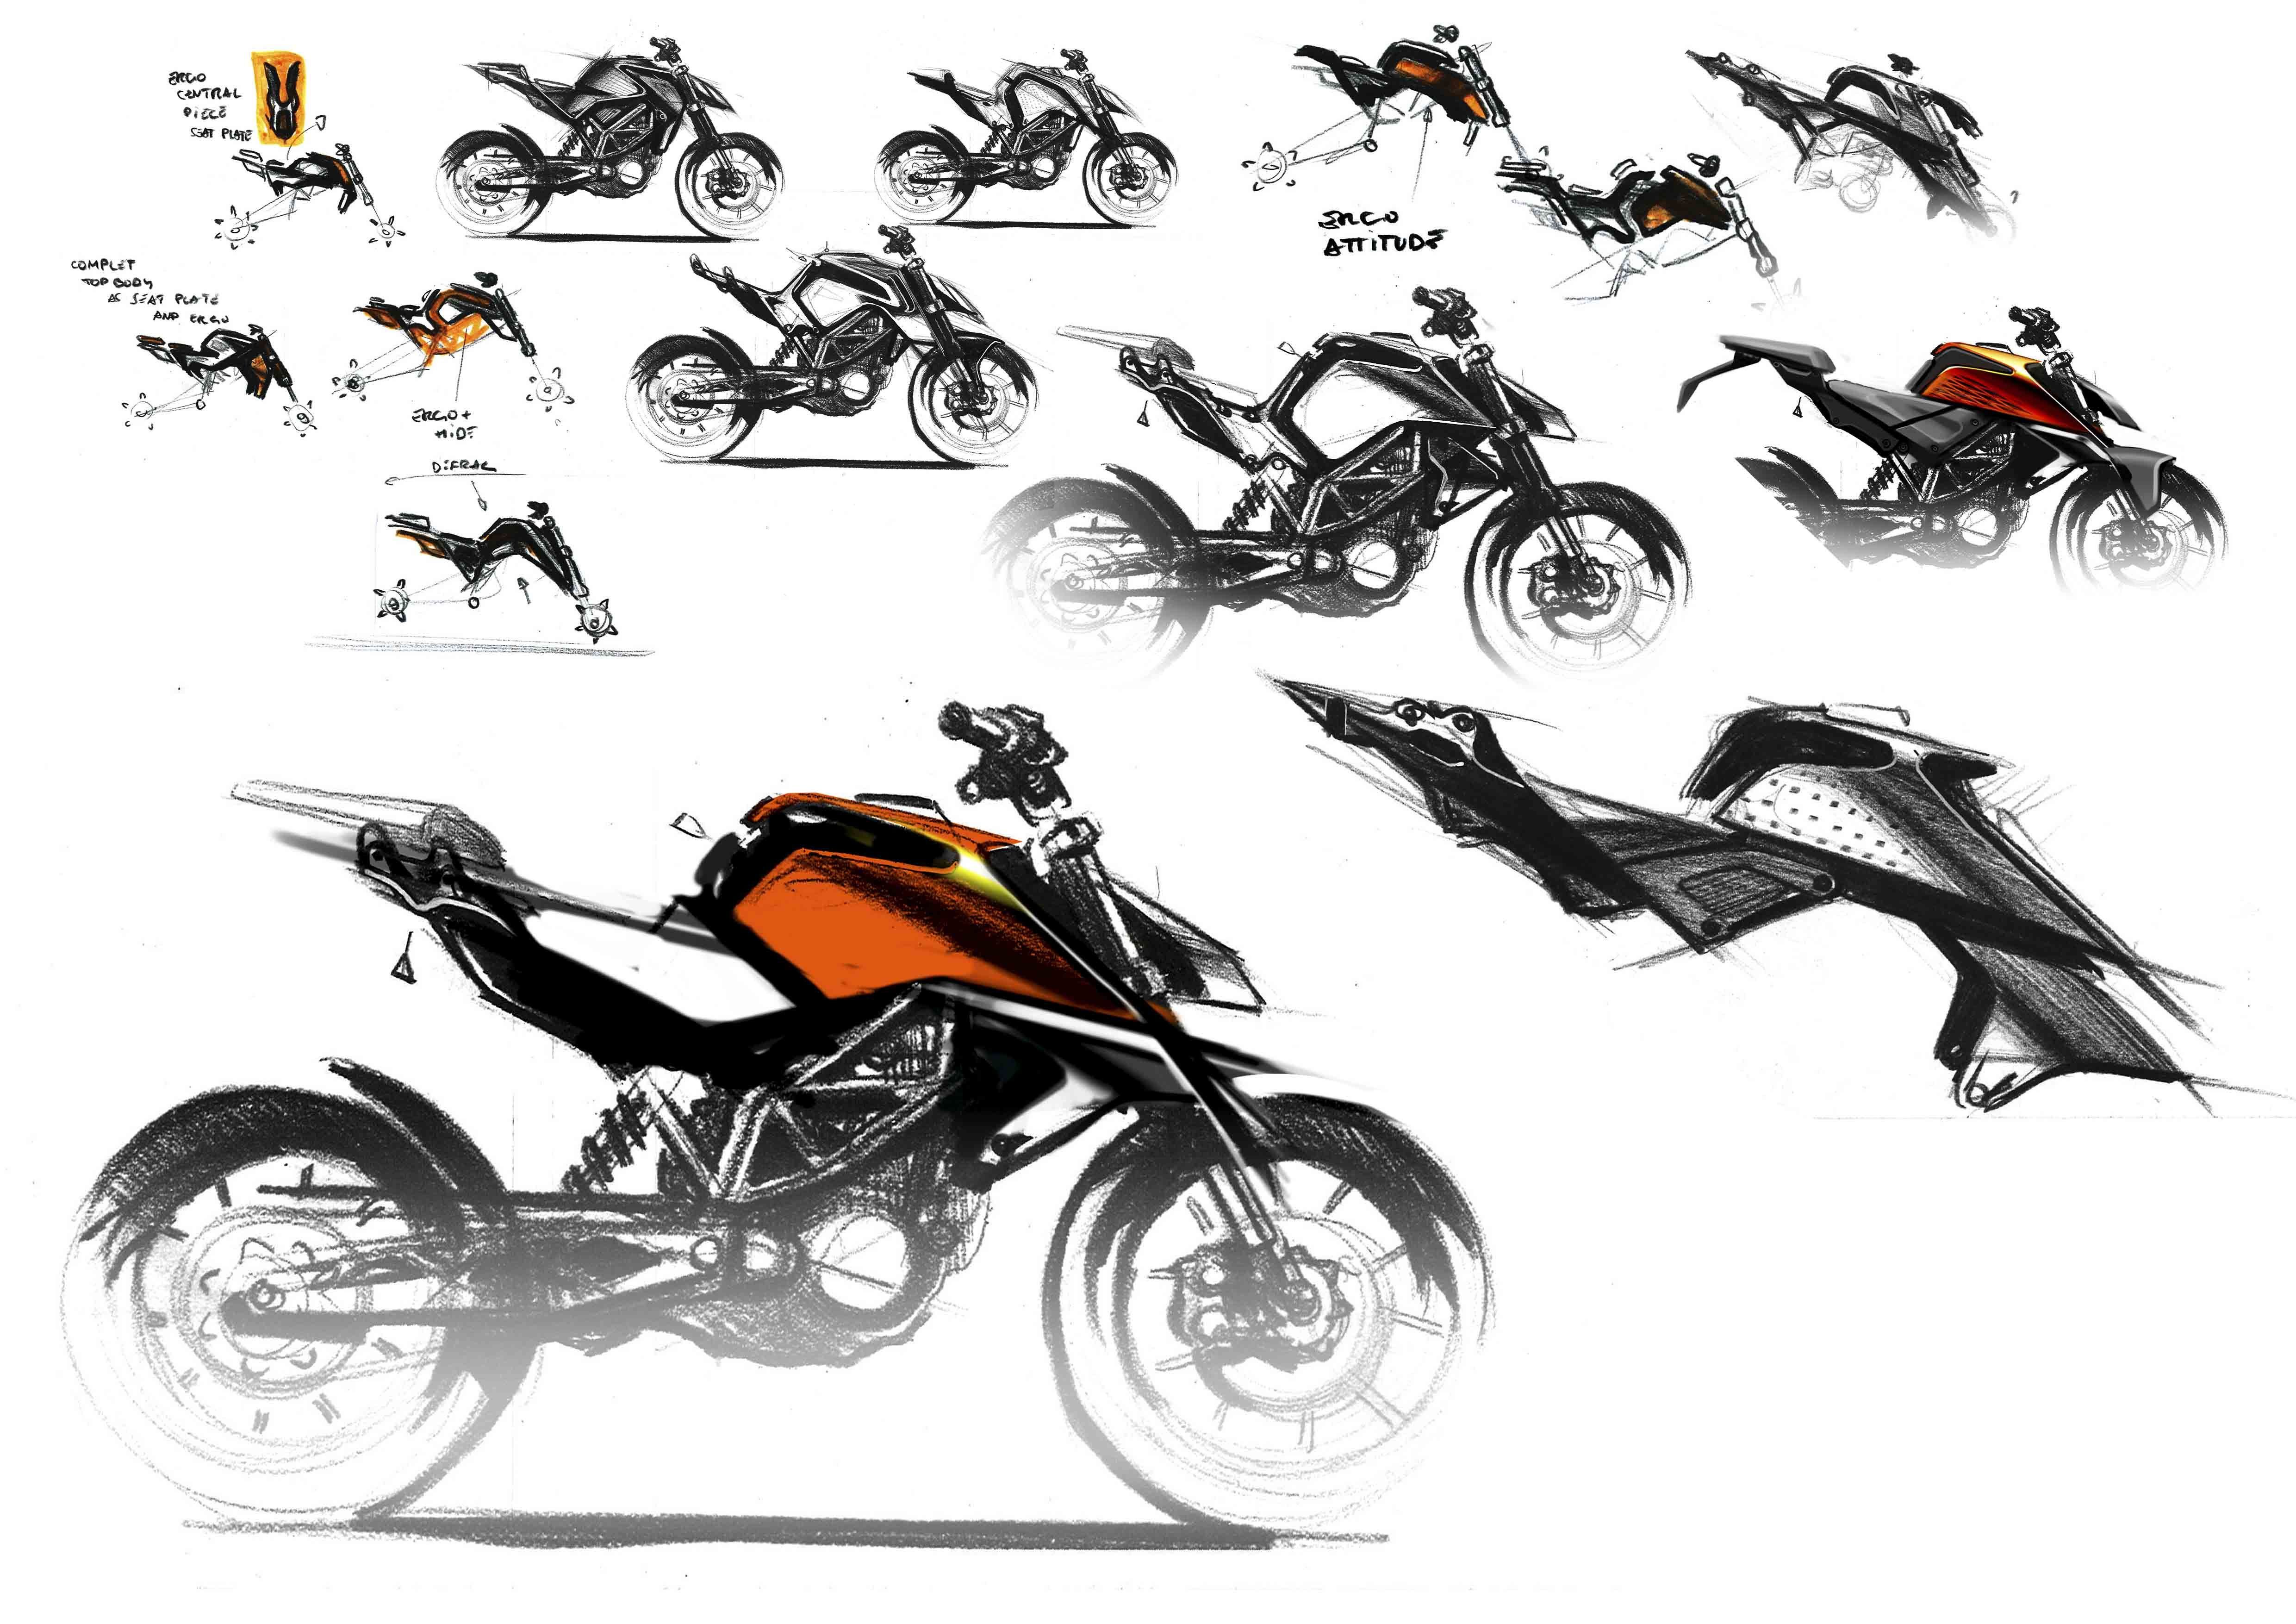 Ktm 390 125 Duke Concept Motorcycles Sketches Bike Sketch